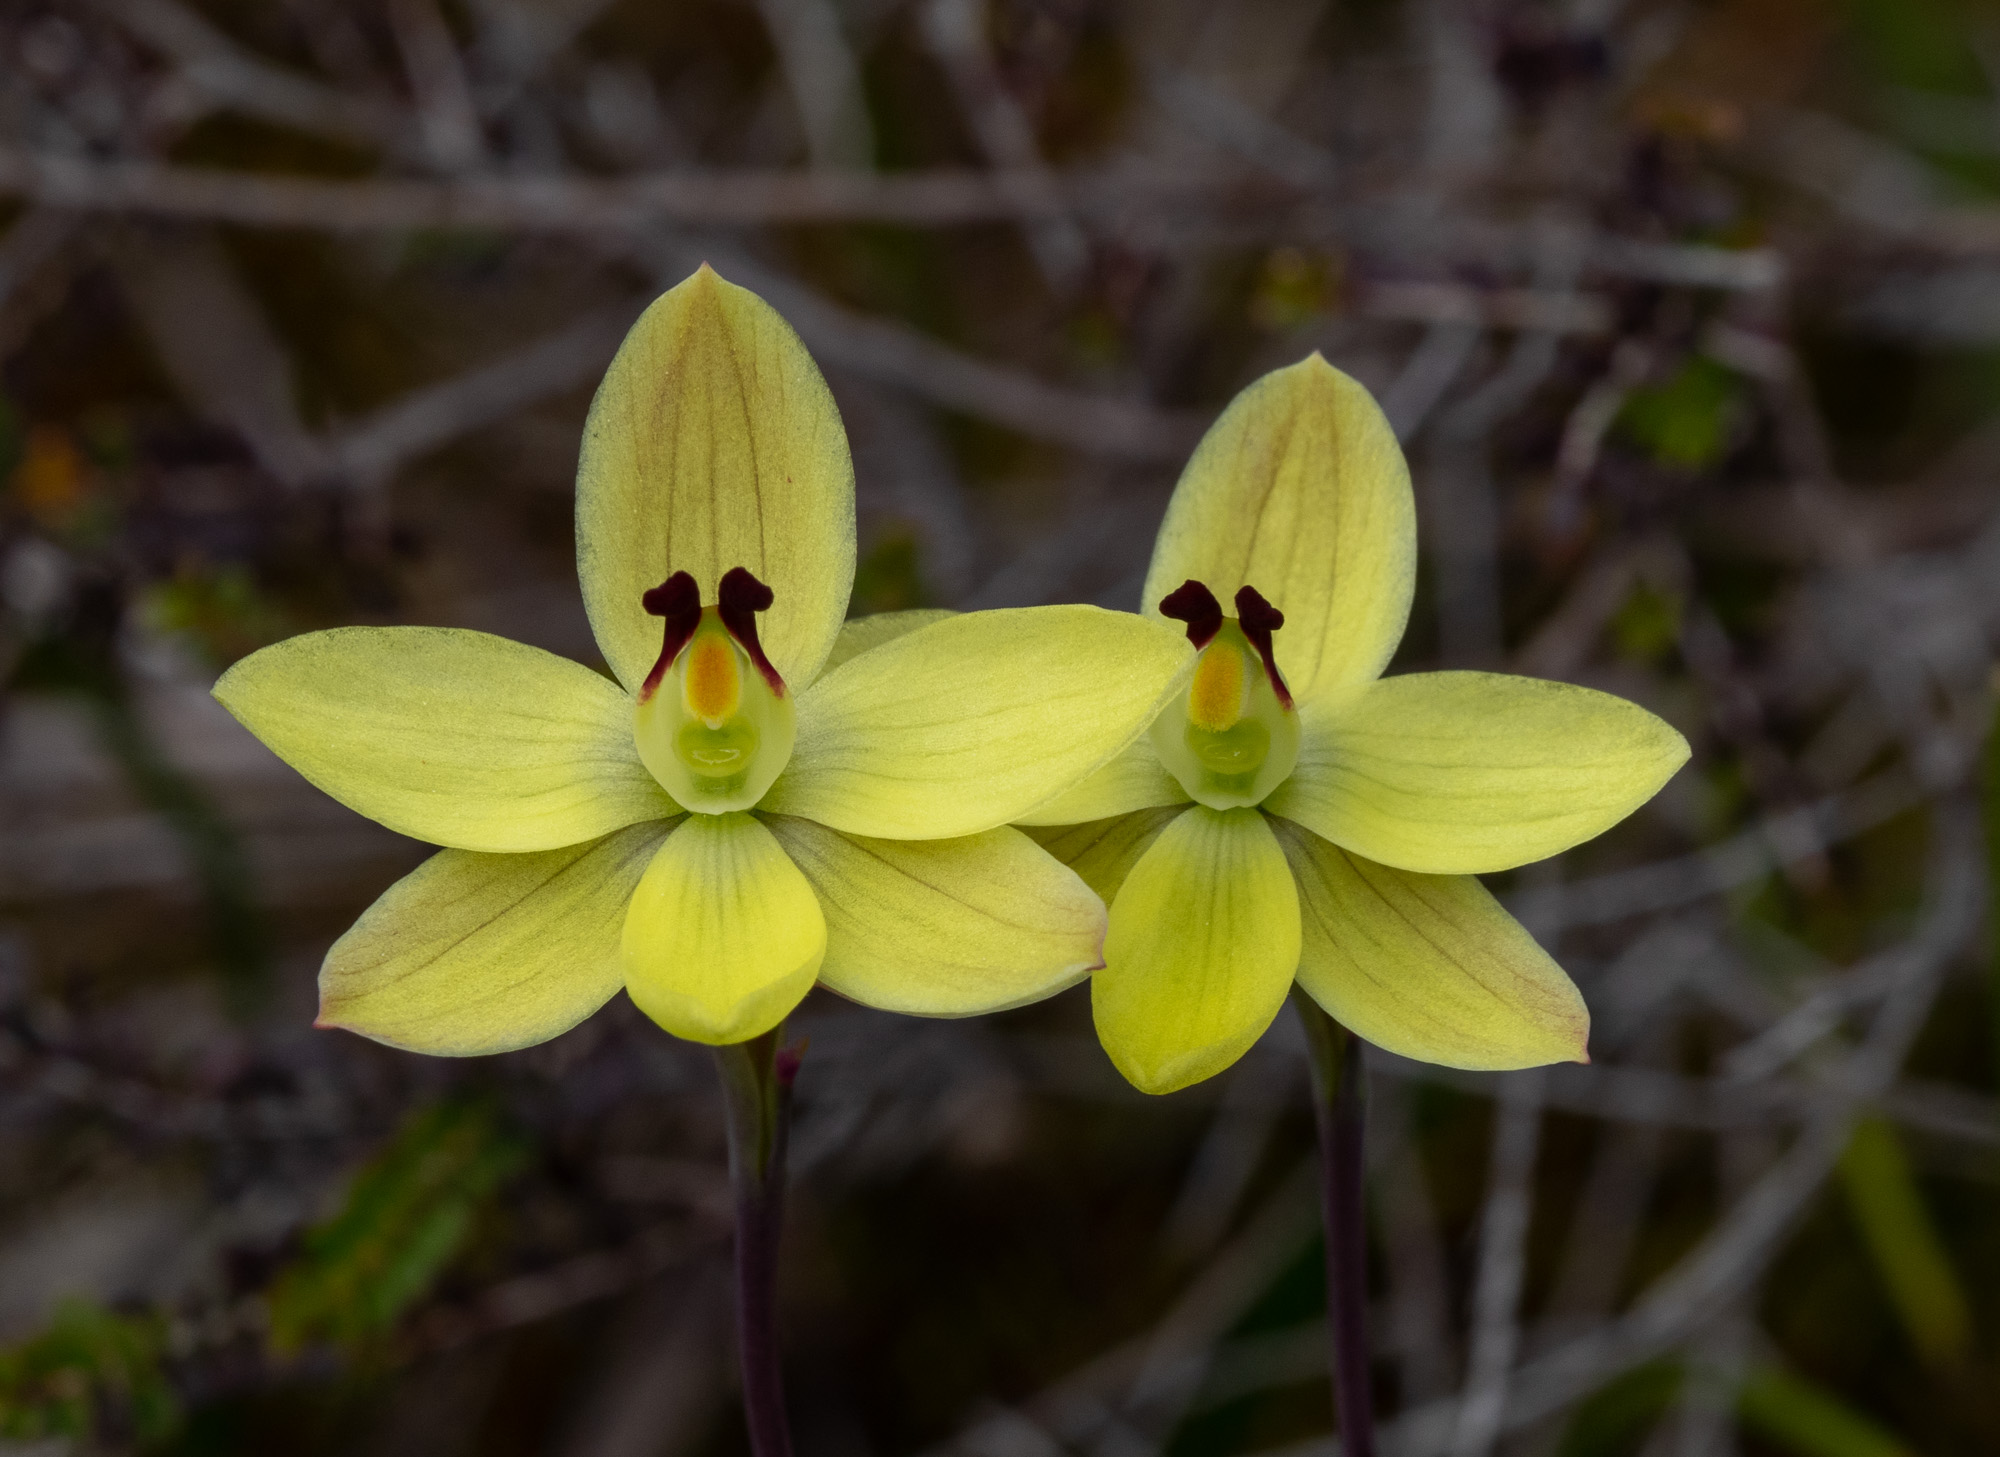 Thelymitra antennifera (Lemon-scented Sun Orchid)